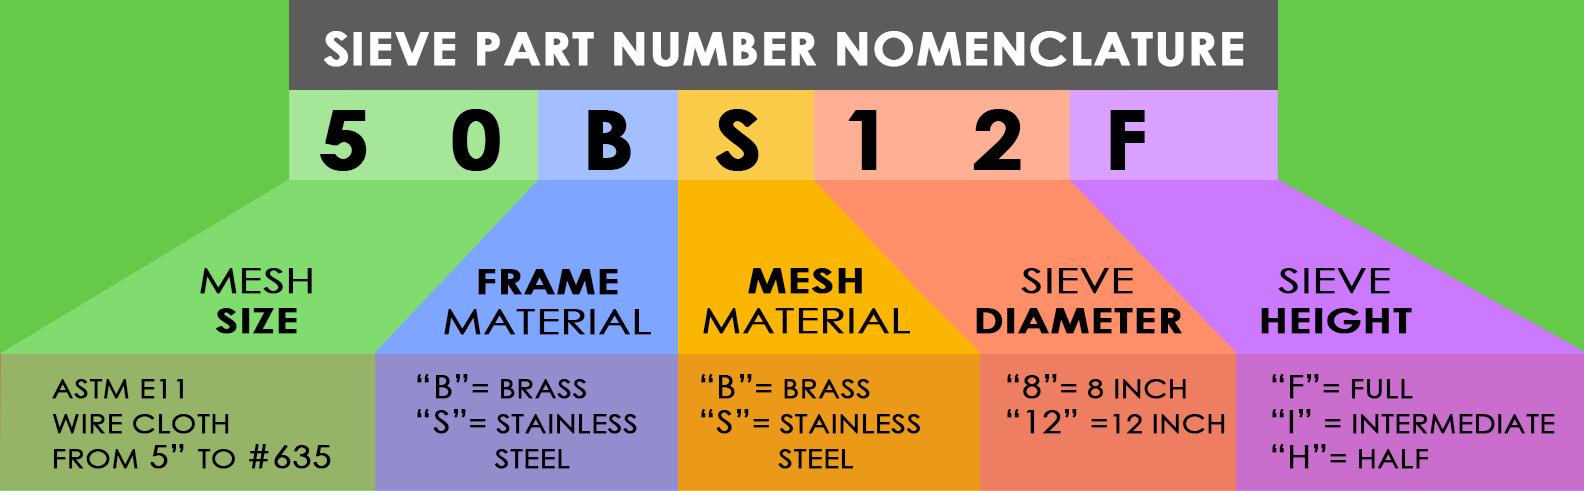 nomenclature-diagram.png